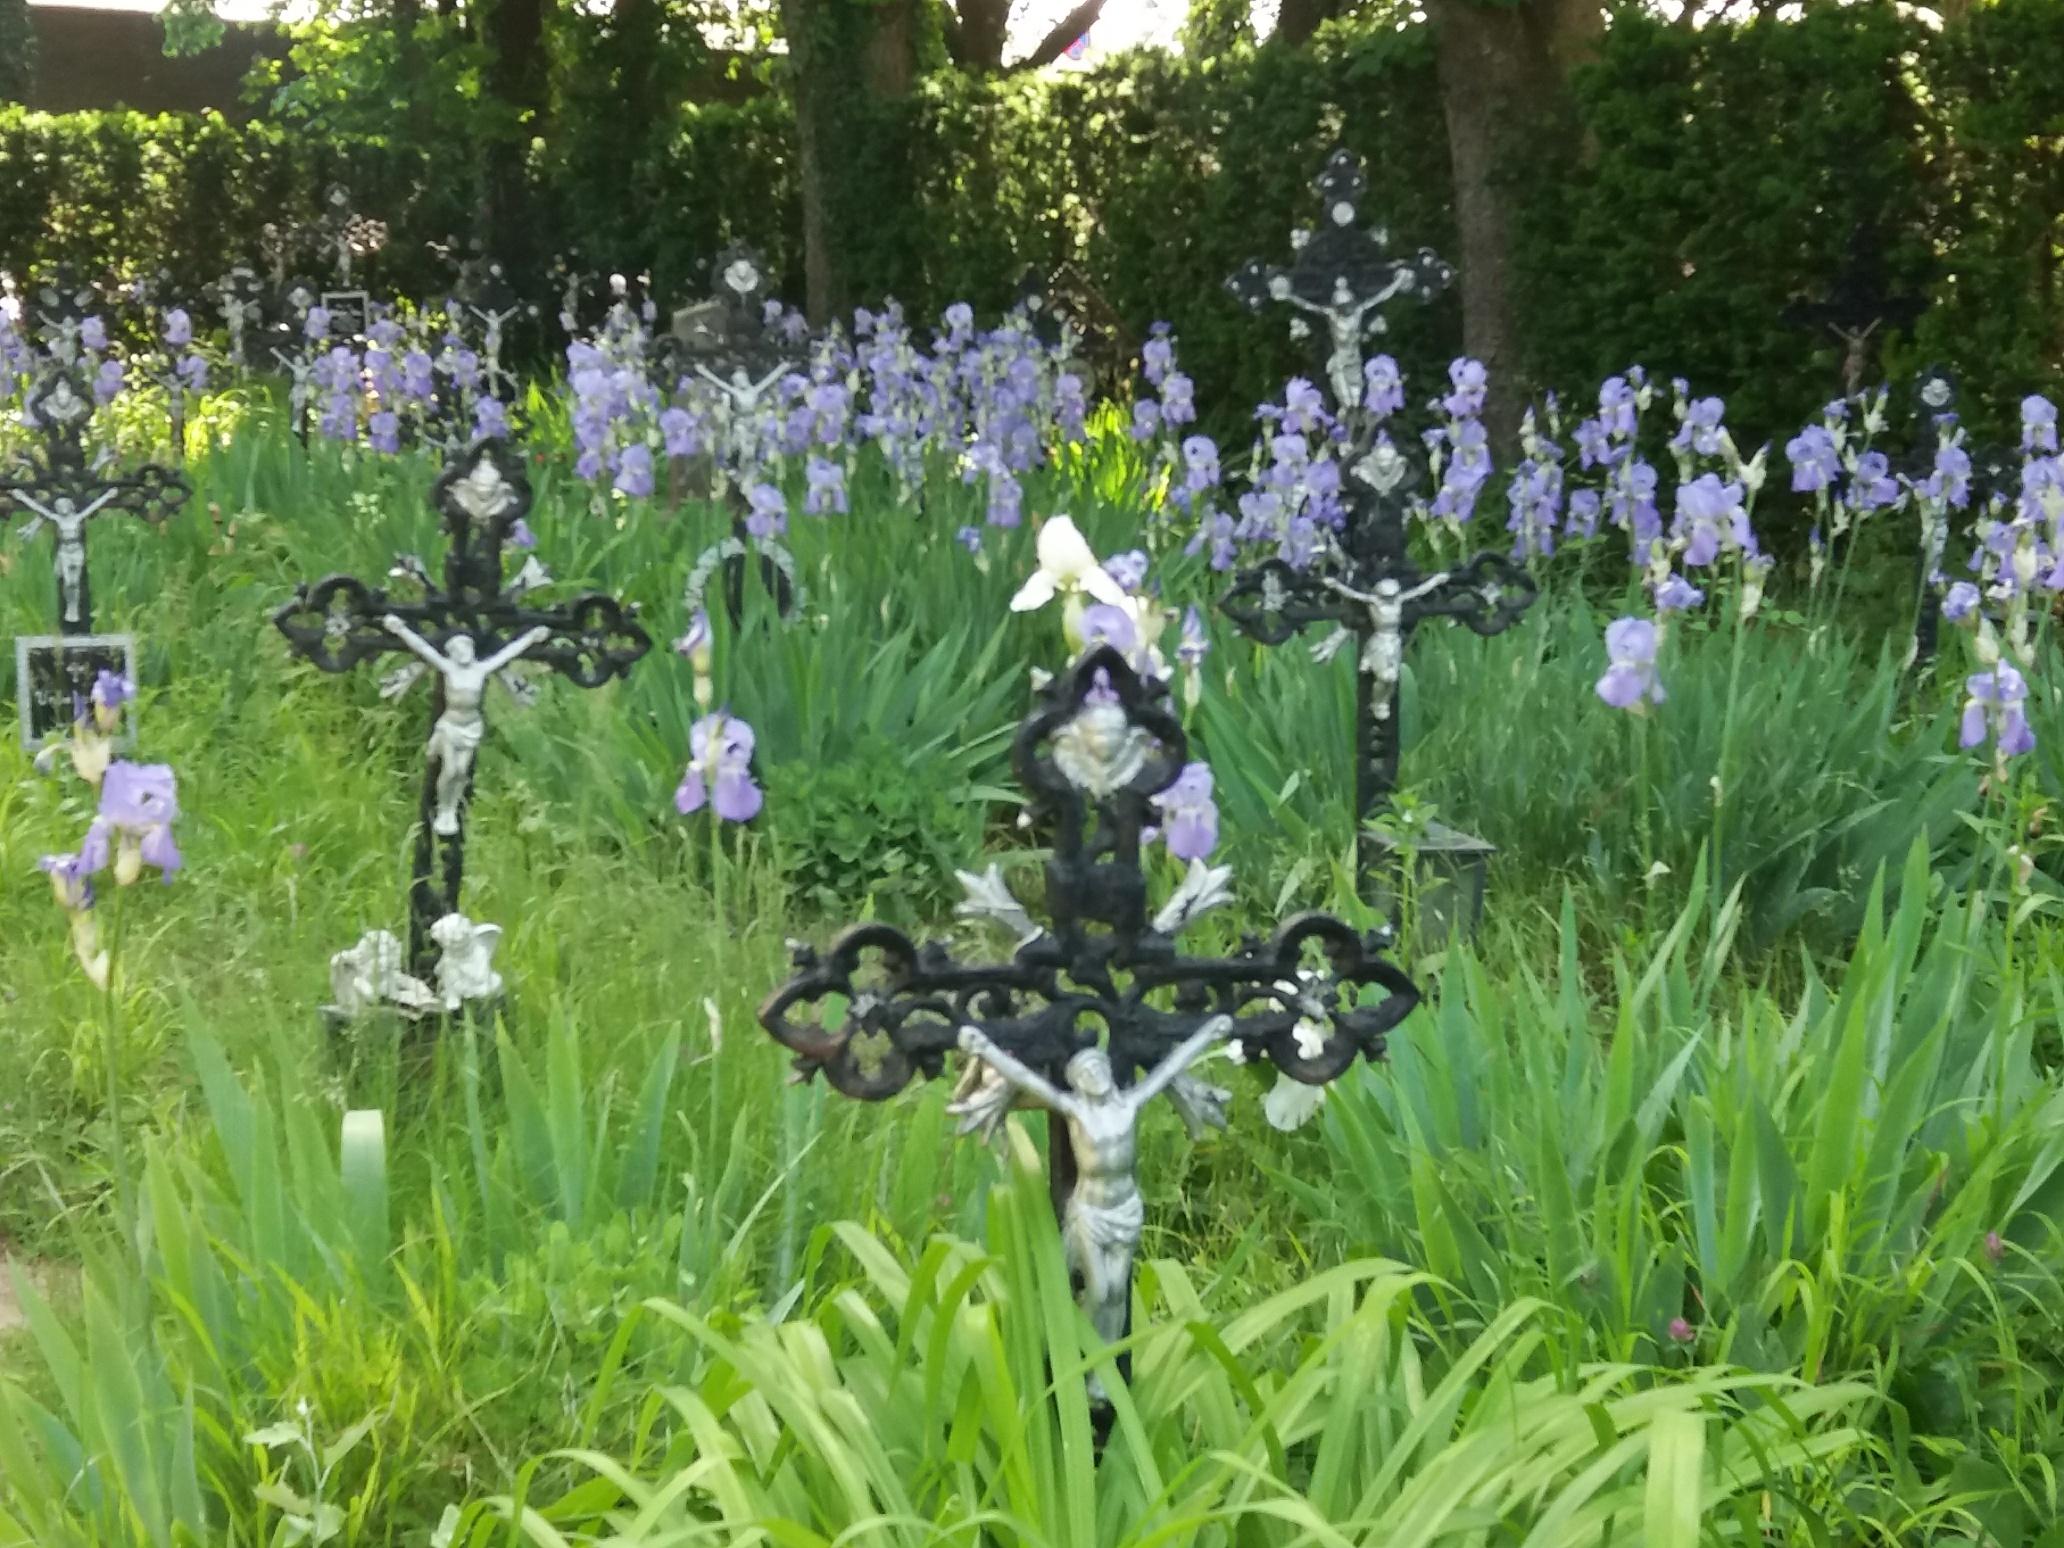 Friedhof der Namenlosen | story.one